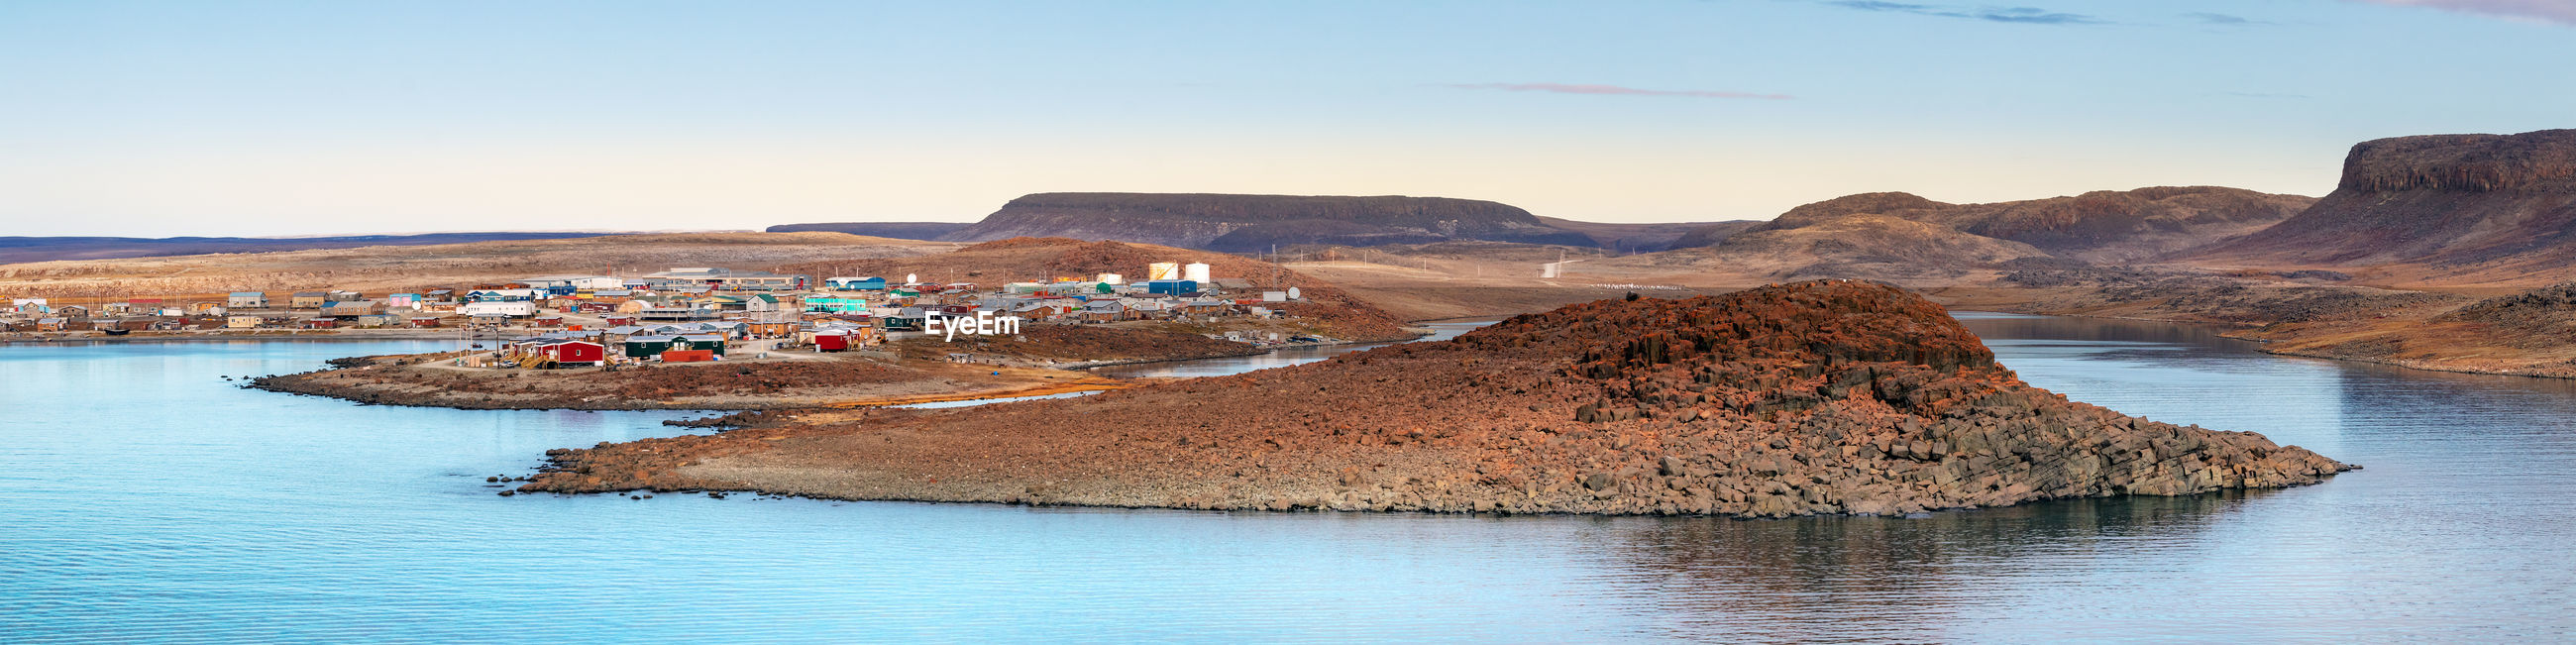 The coastline of ulukhaktok, at the amundsen gulf in the northwest territories, canada.